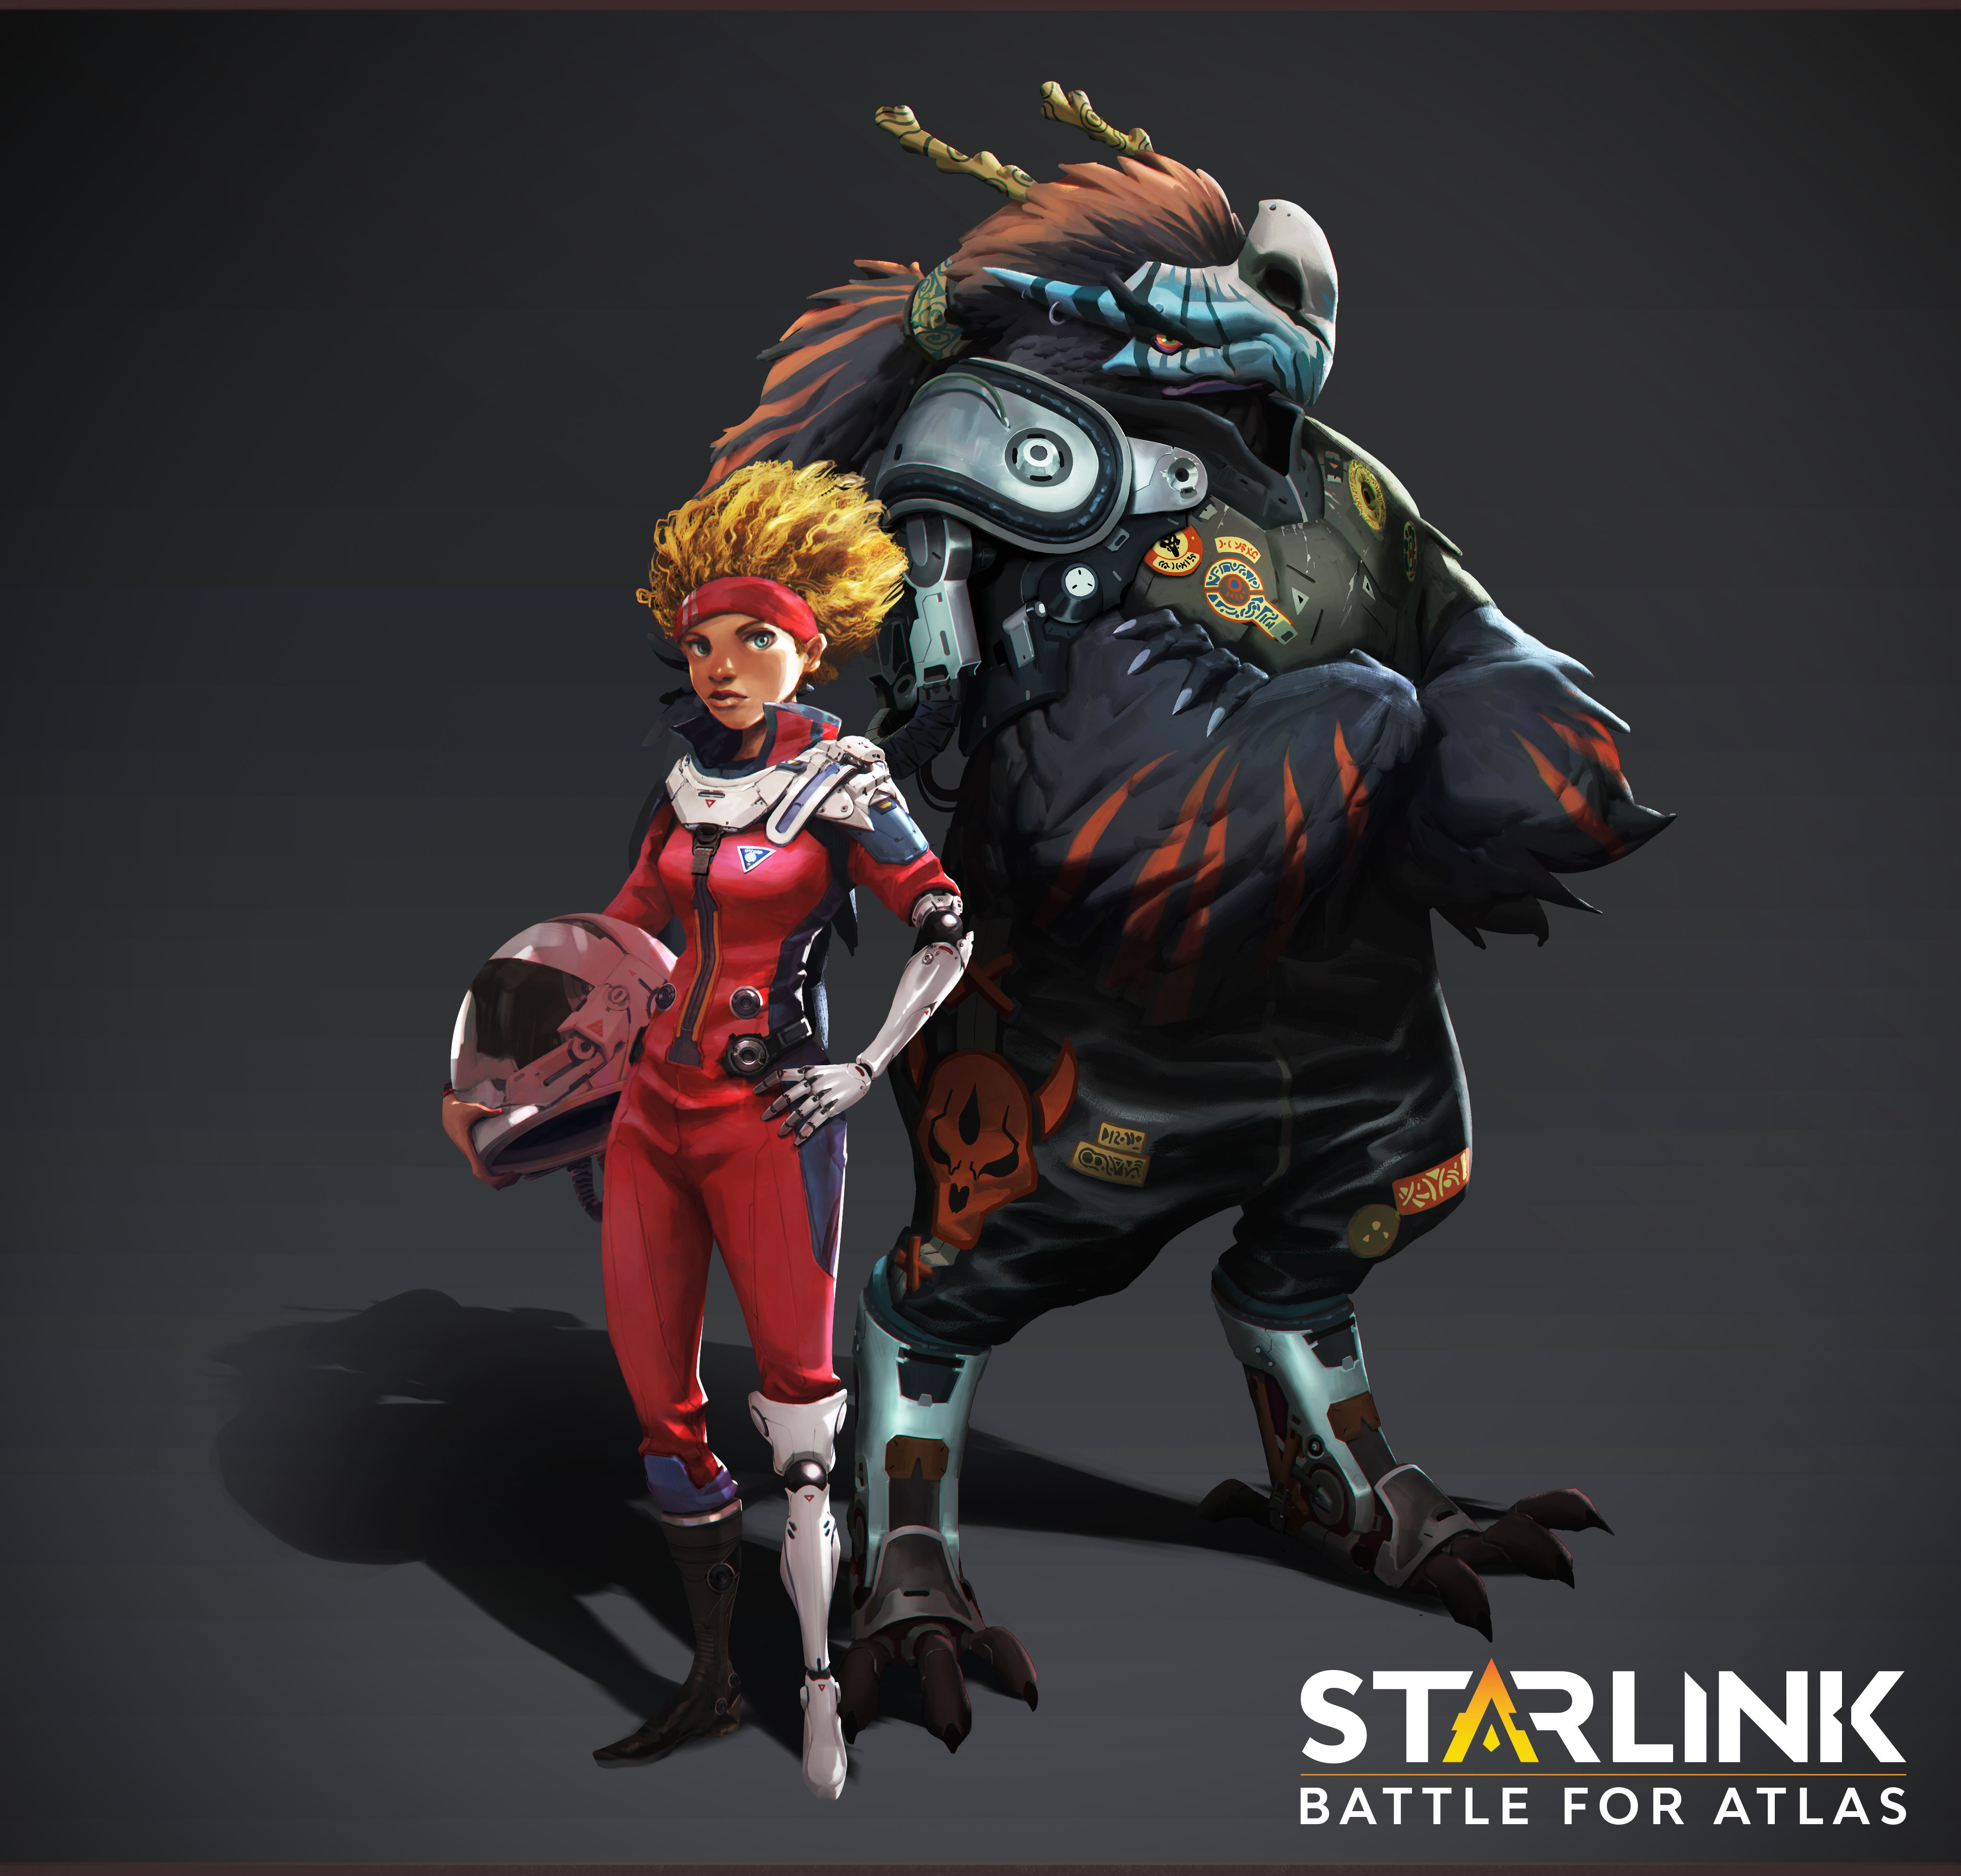 Starlink Battle for Atlas (7)